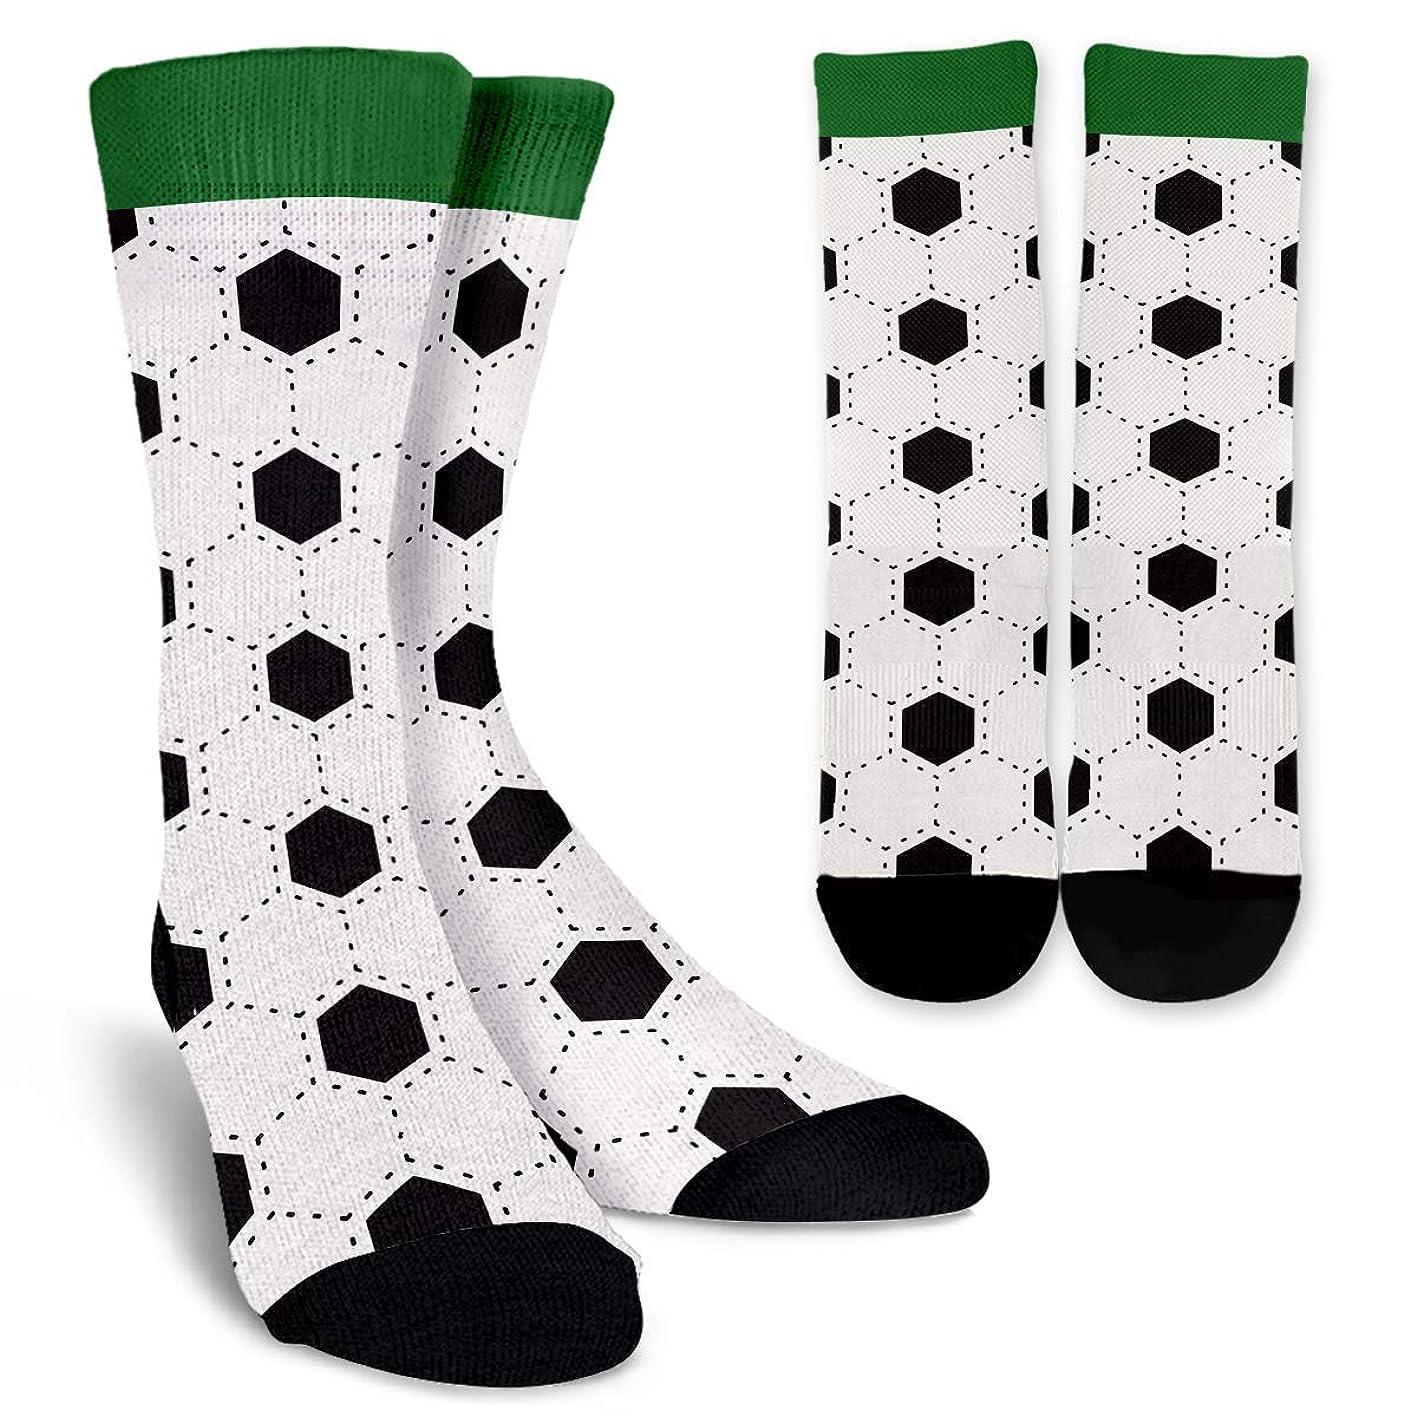 Funny Soccer Unisex Colorful Designs Trouser Socks Soccer Themed Gifts for Men Women Girls Boys Players Coaches Teachers Sport Lovers vcgysfgbqhm011